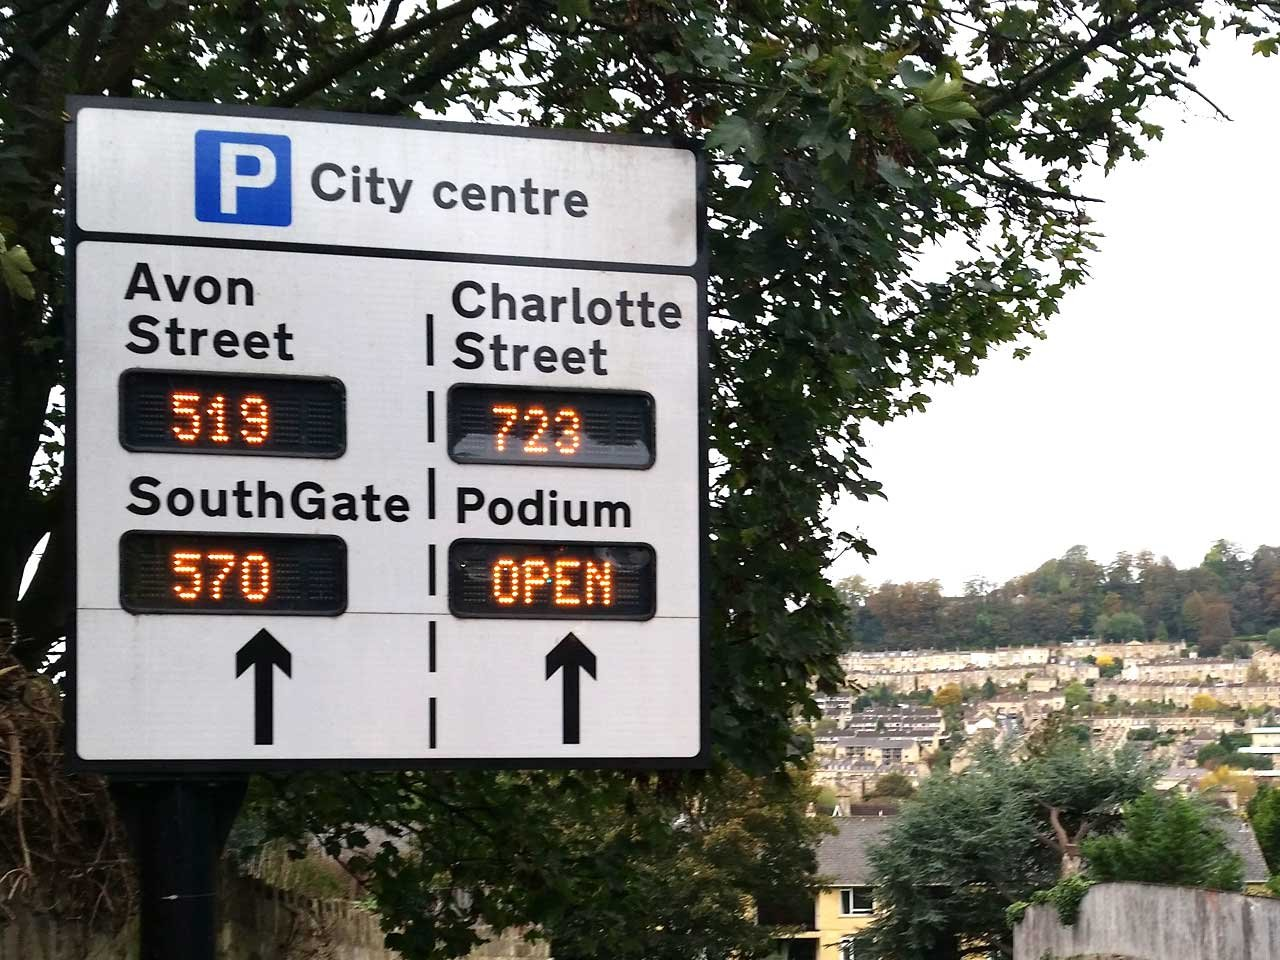 Bath parking sign